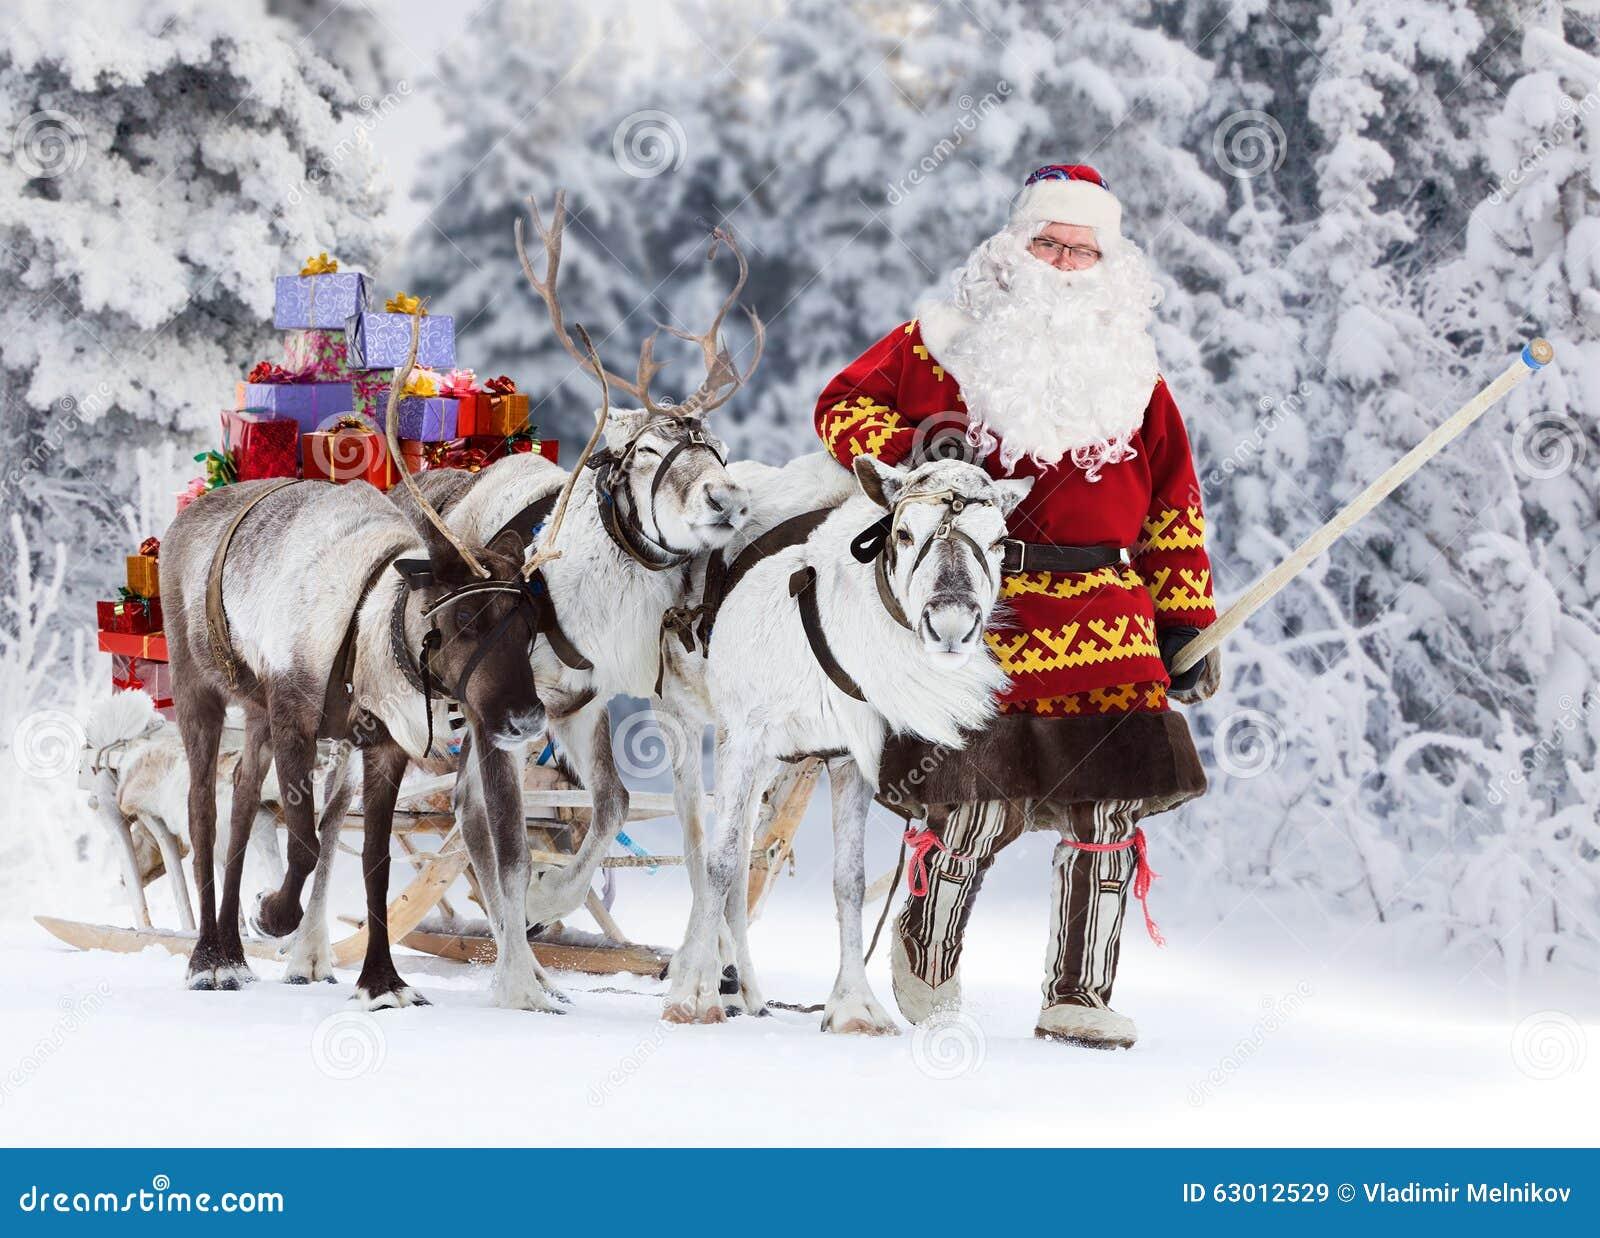 santa claus and his reindeer stock image image of santa person